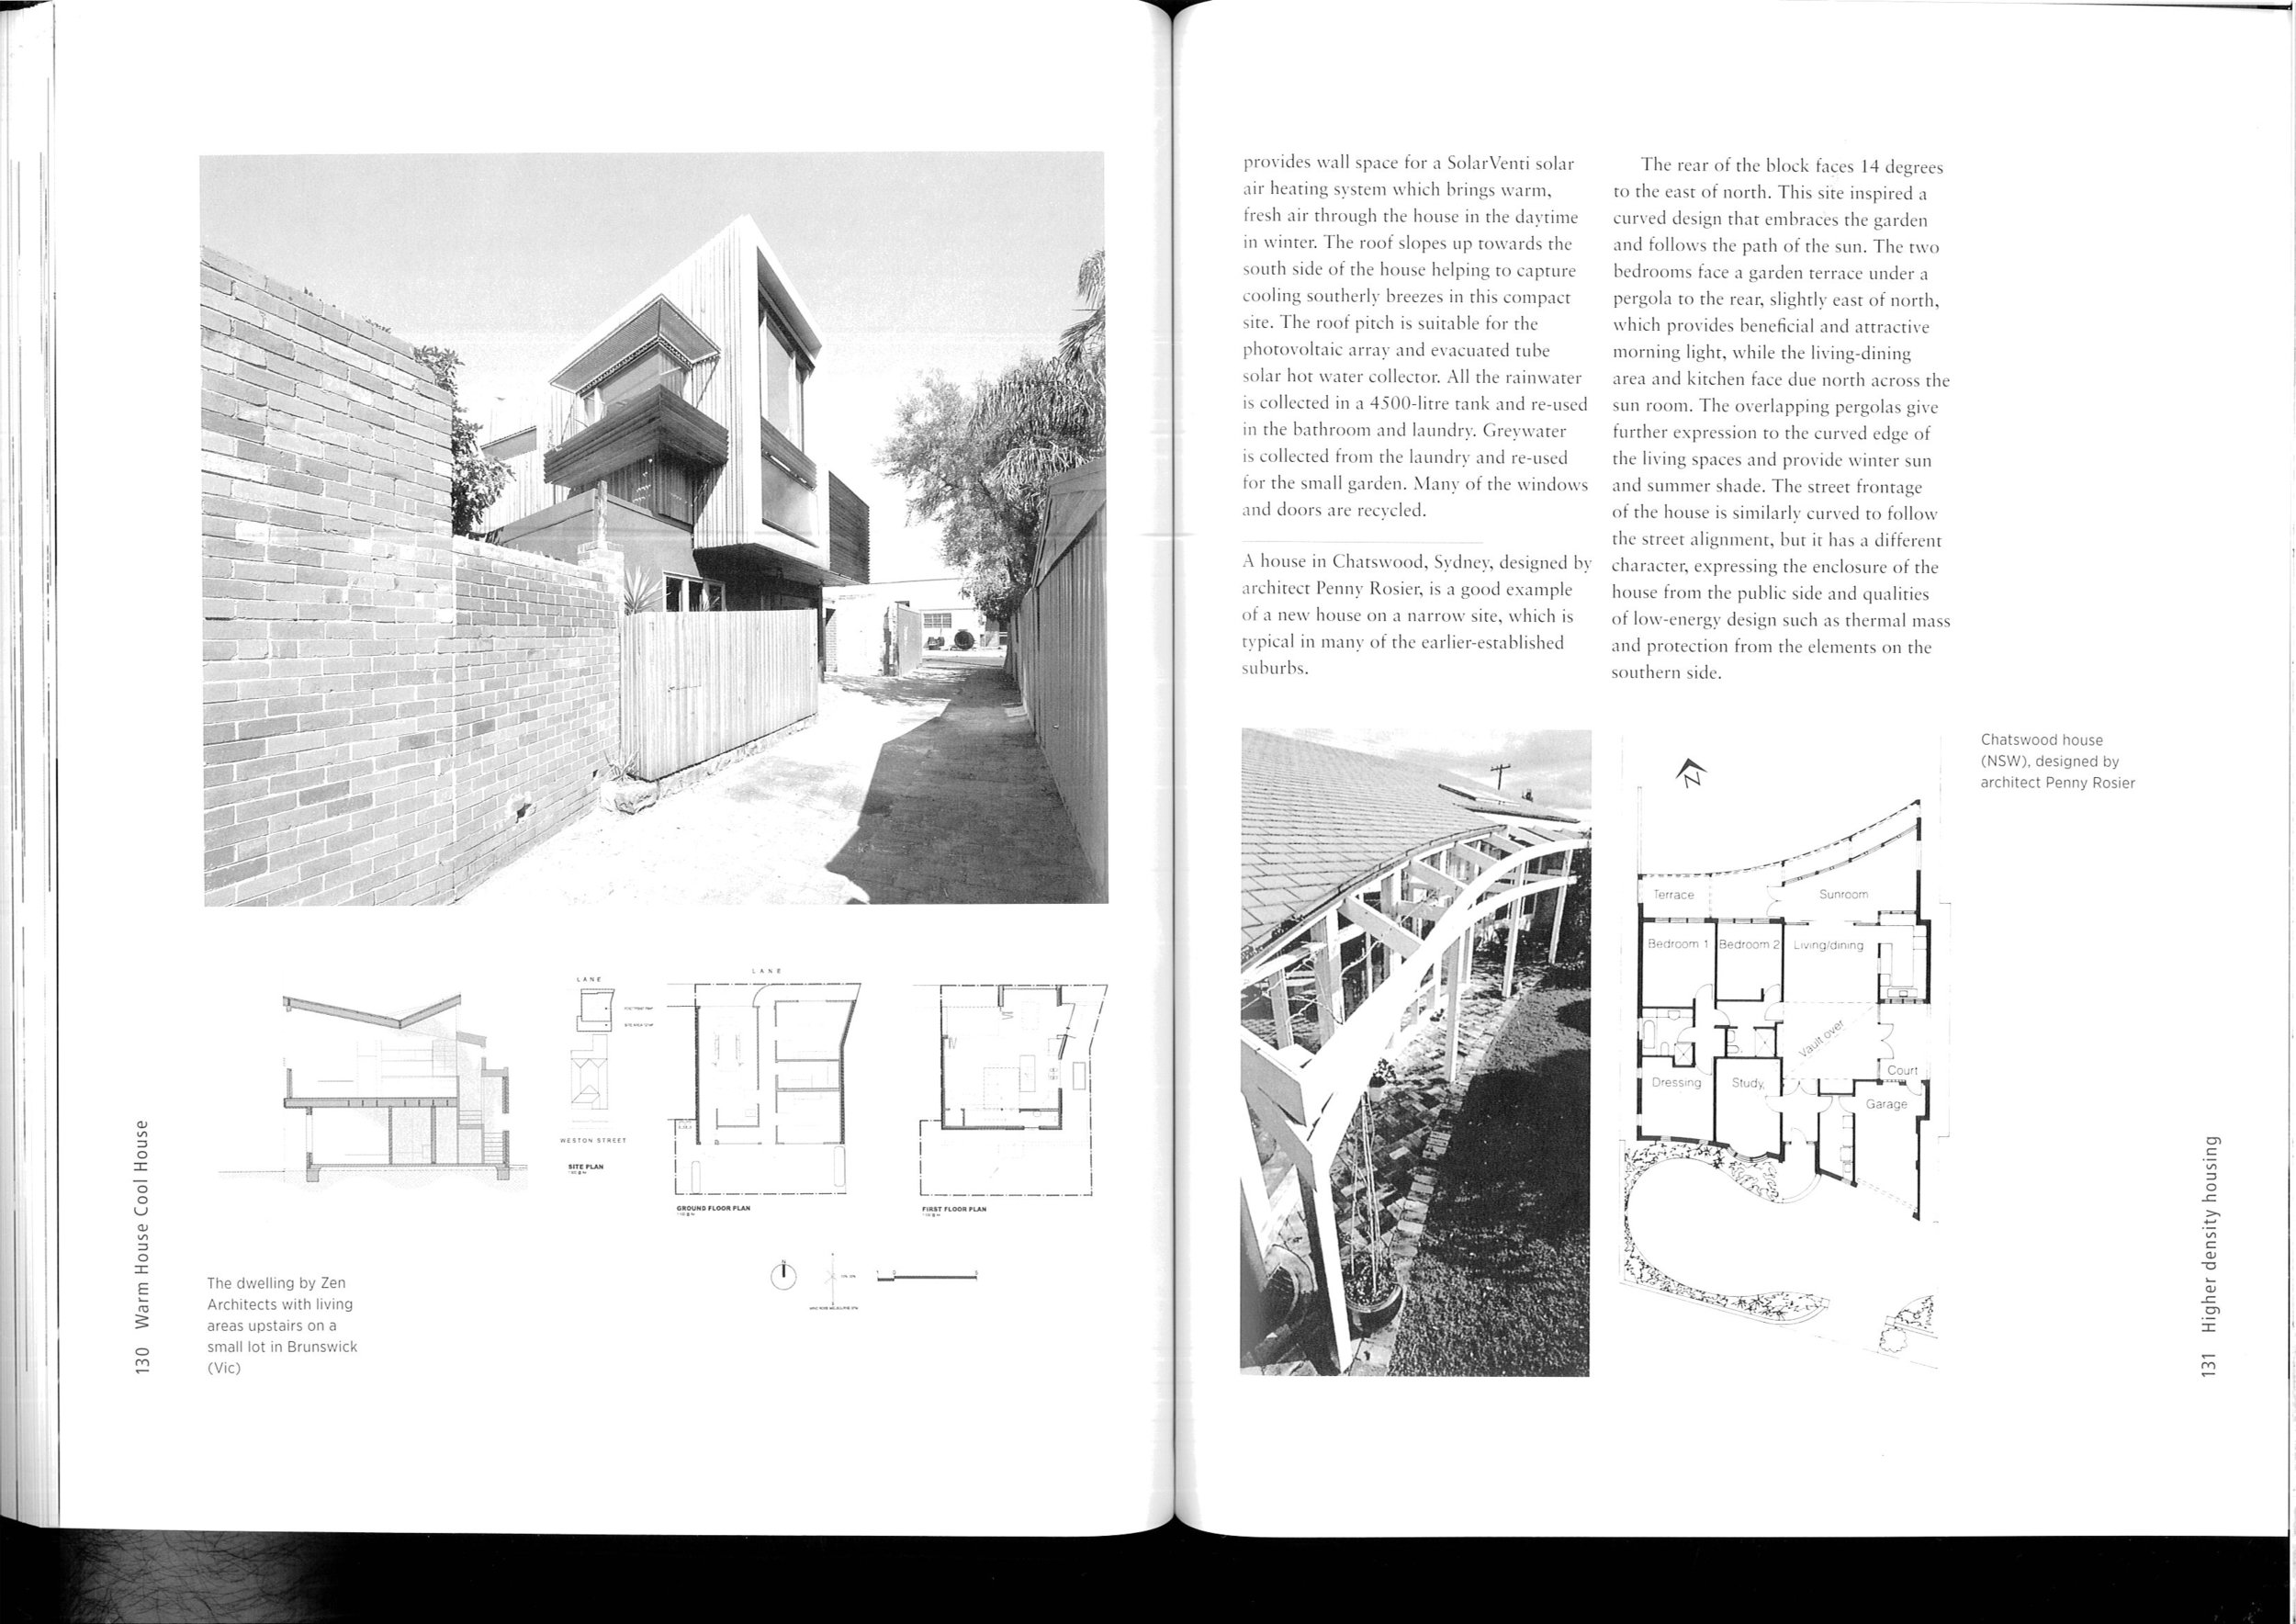 2011_Warm House Cool House_Page_5.jpg